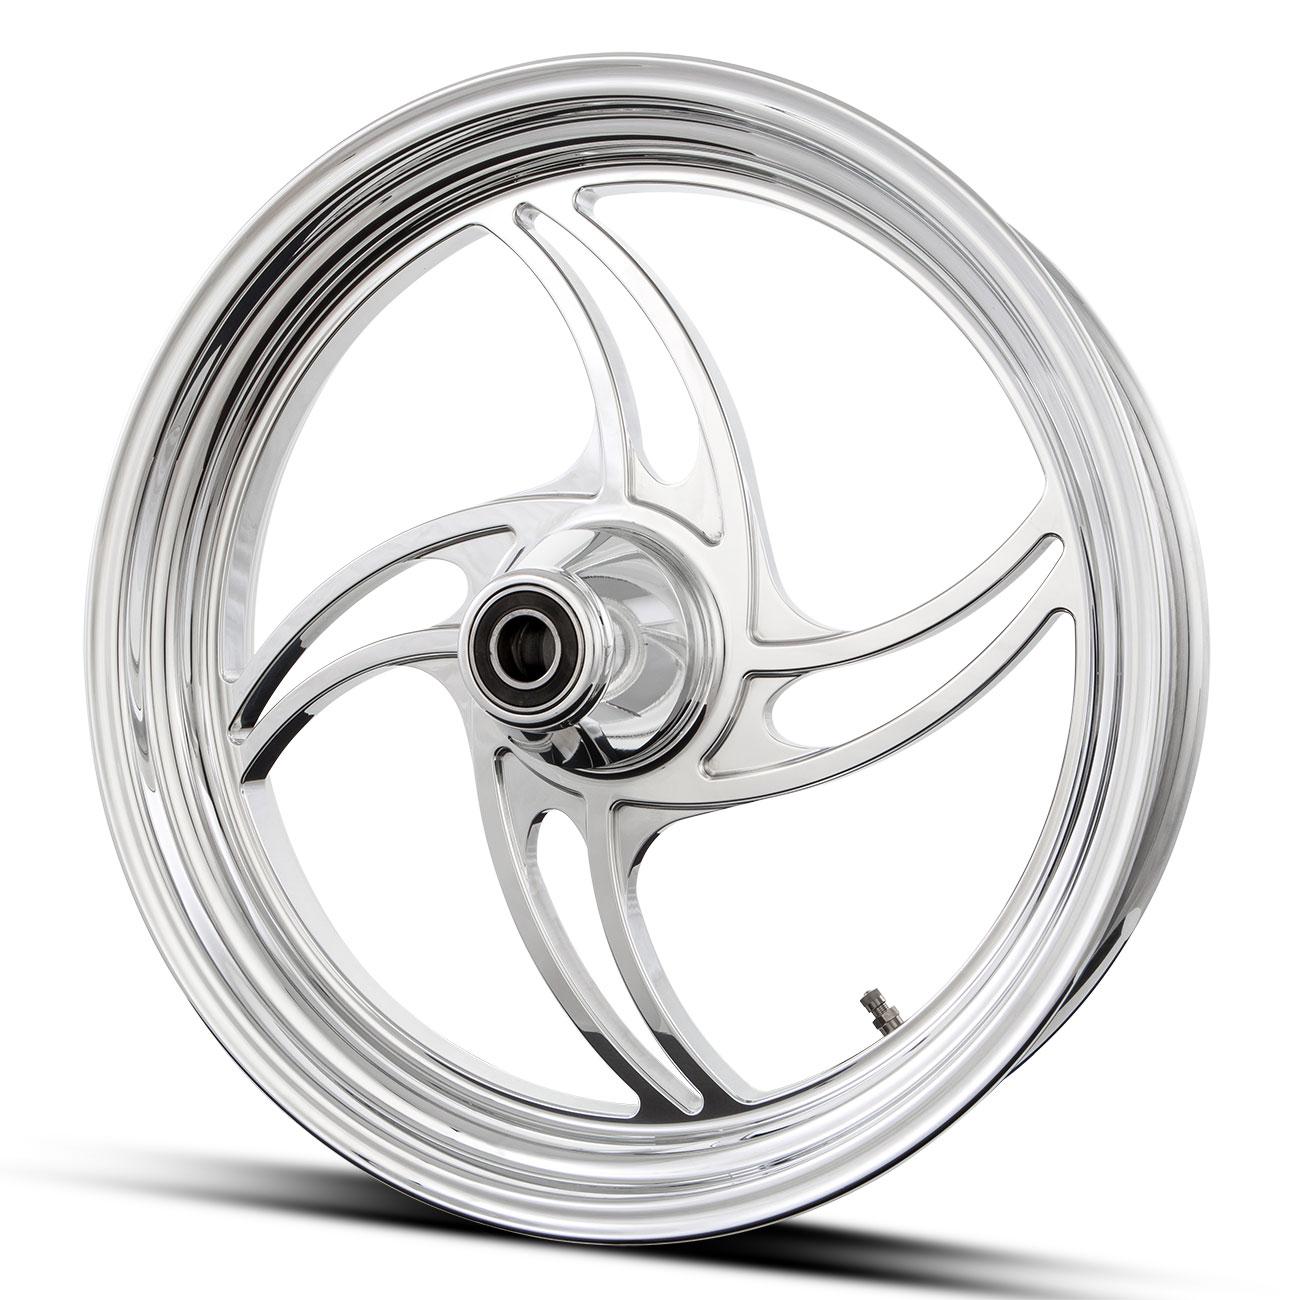 Rad-Design Freestyle